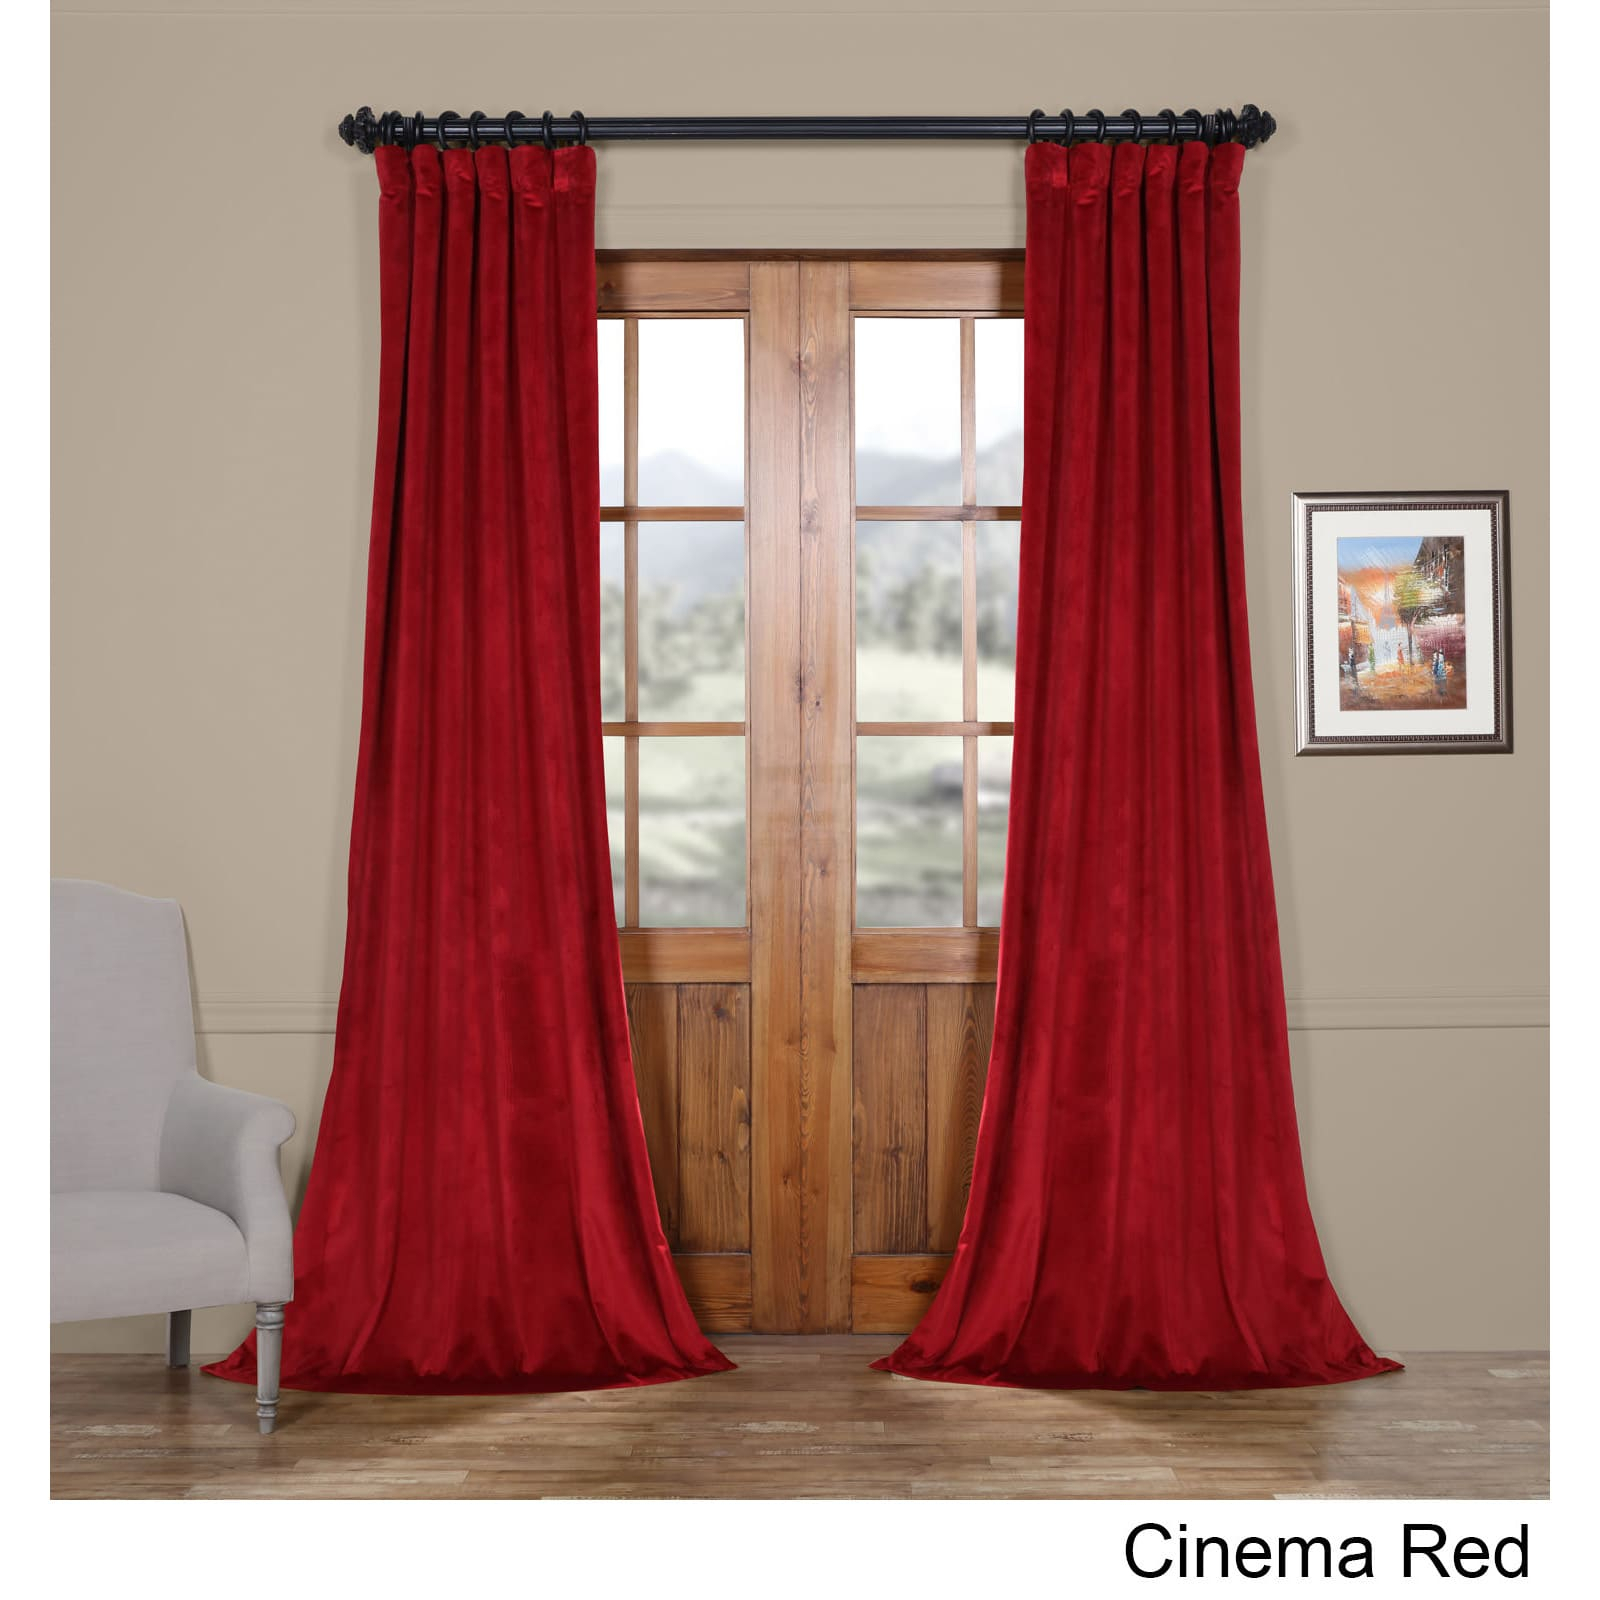 Exclusive Fabrics Heritage Plush Velvet Curtain In 2019 Regarding Heritage Plush Velvet Curtains (View 5 of 20)